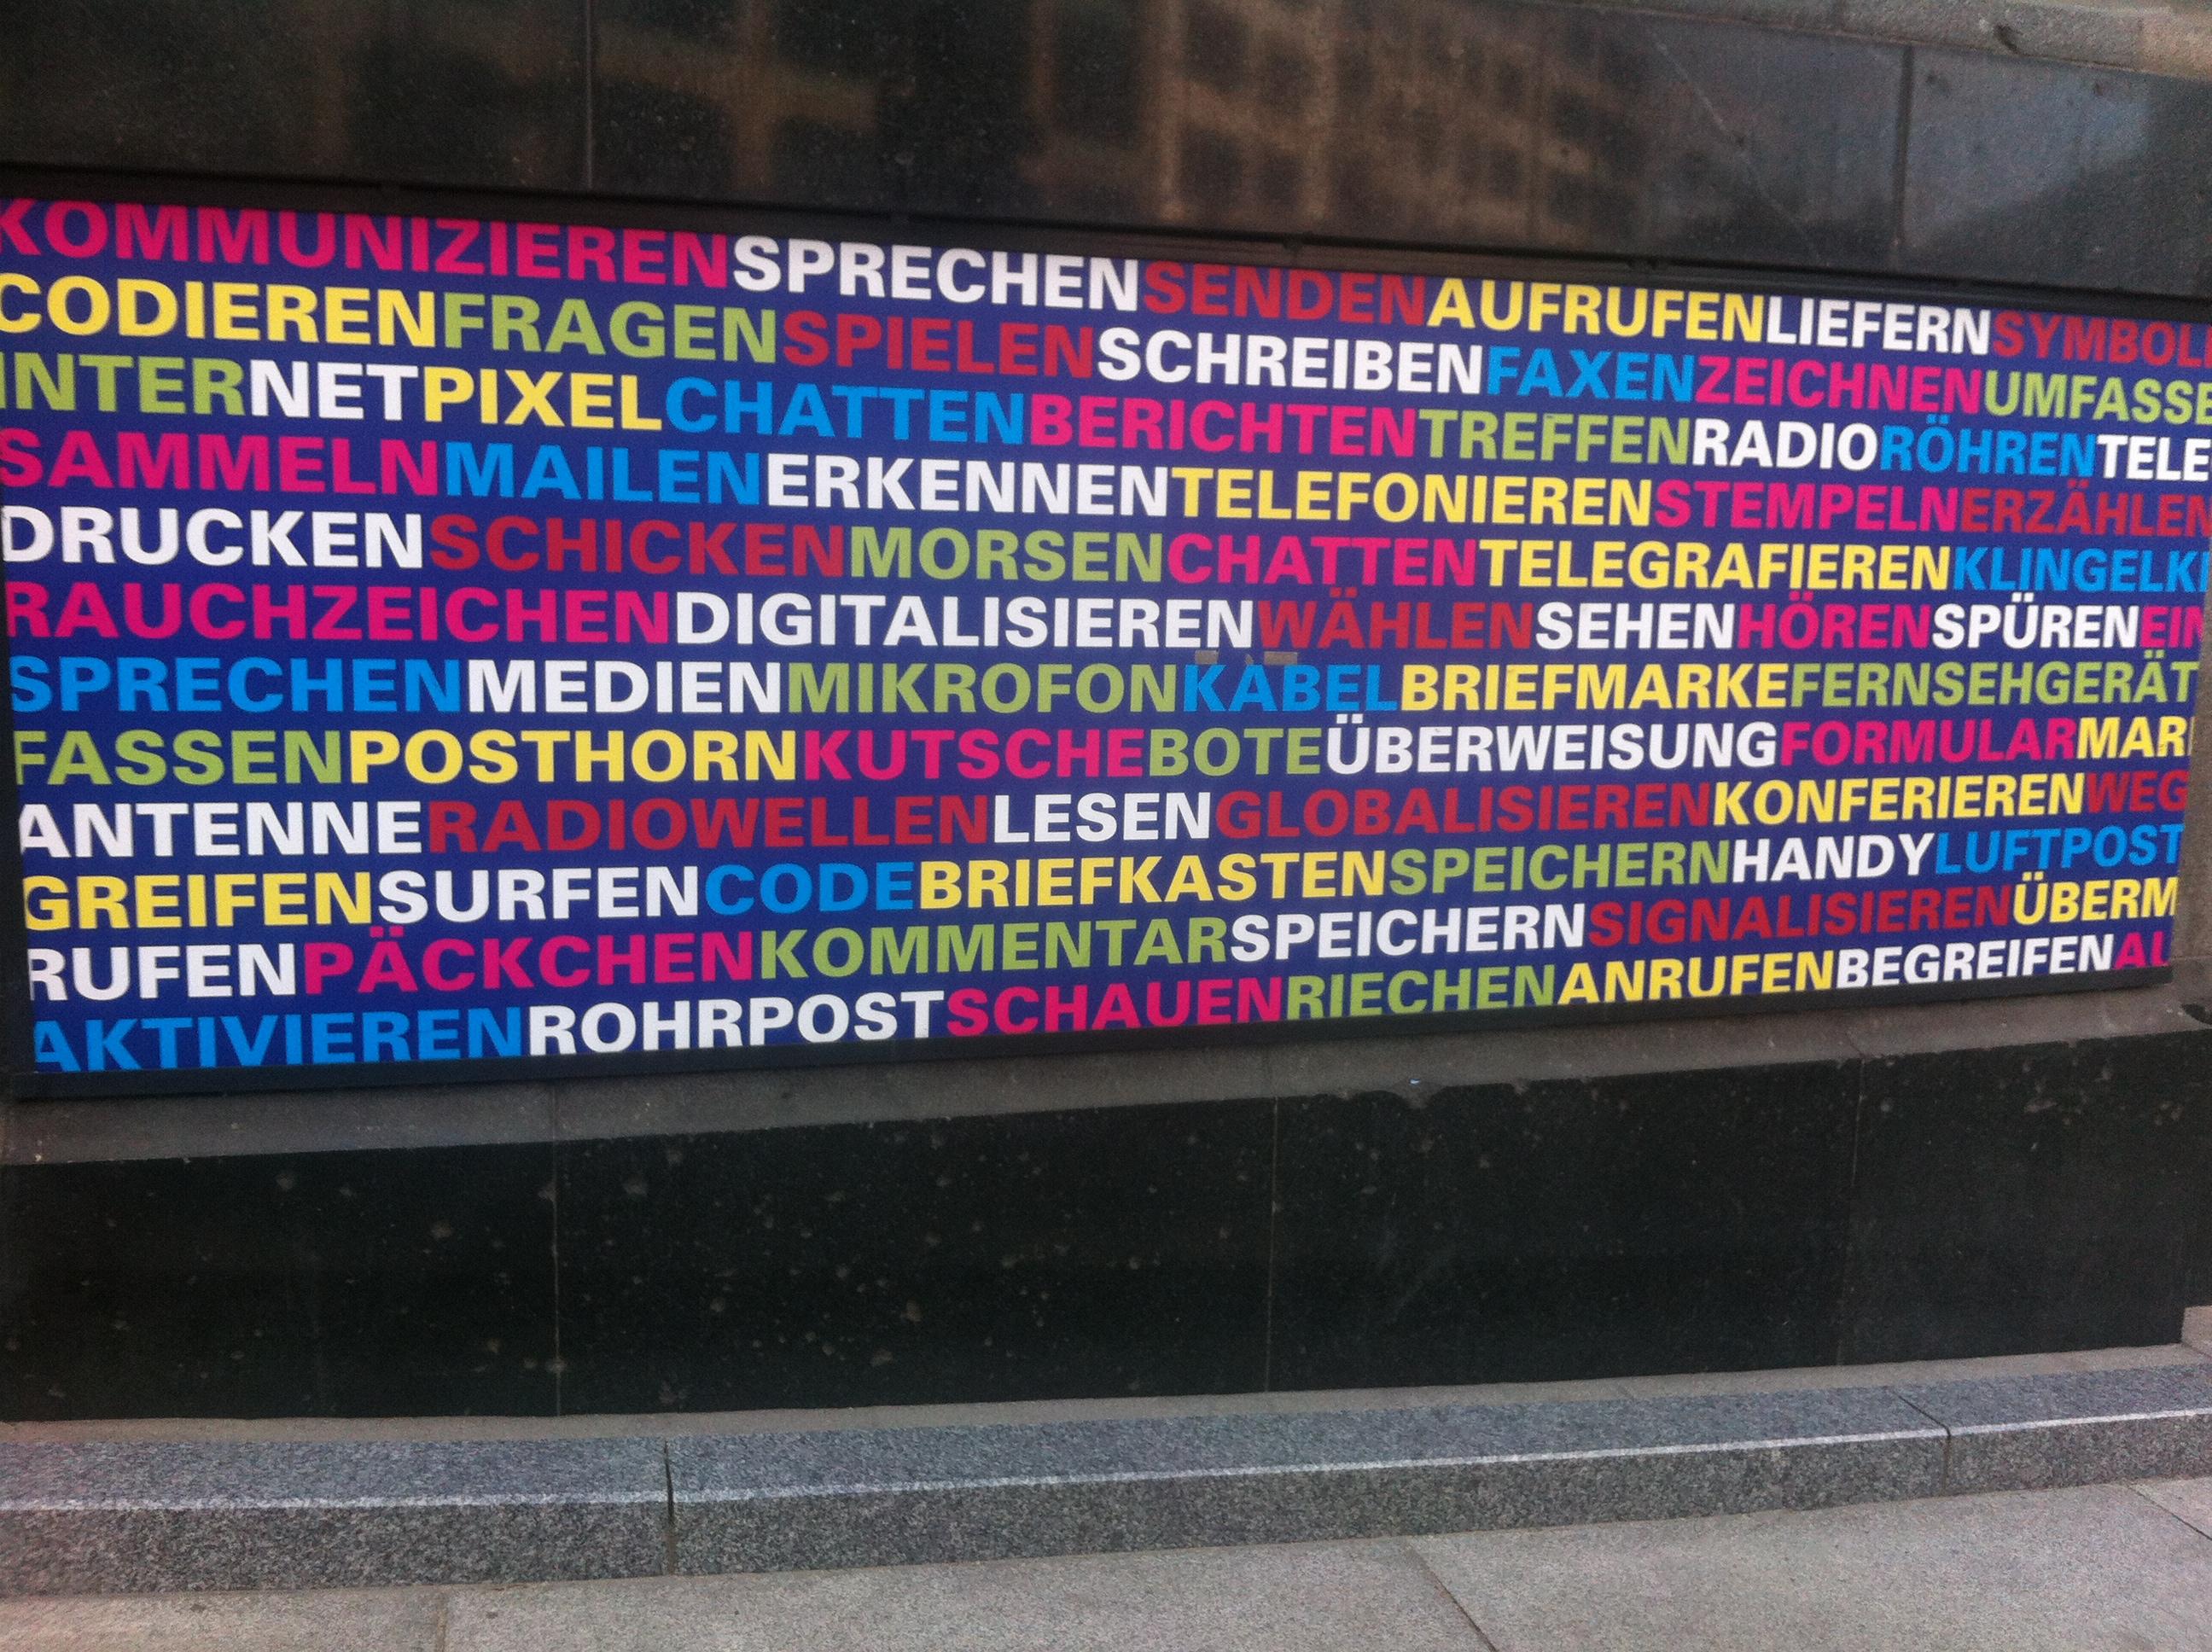 Museum der Kommunikation, Berlin, 08/2012